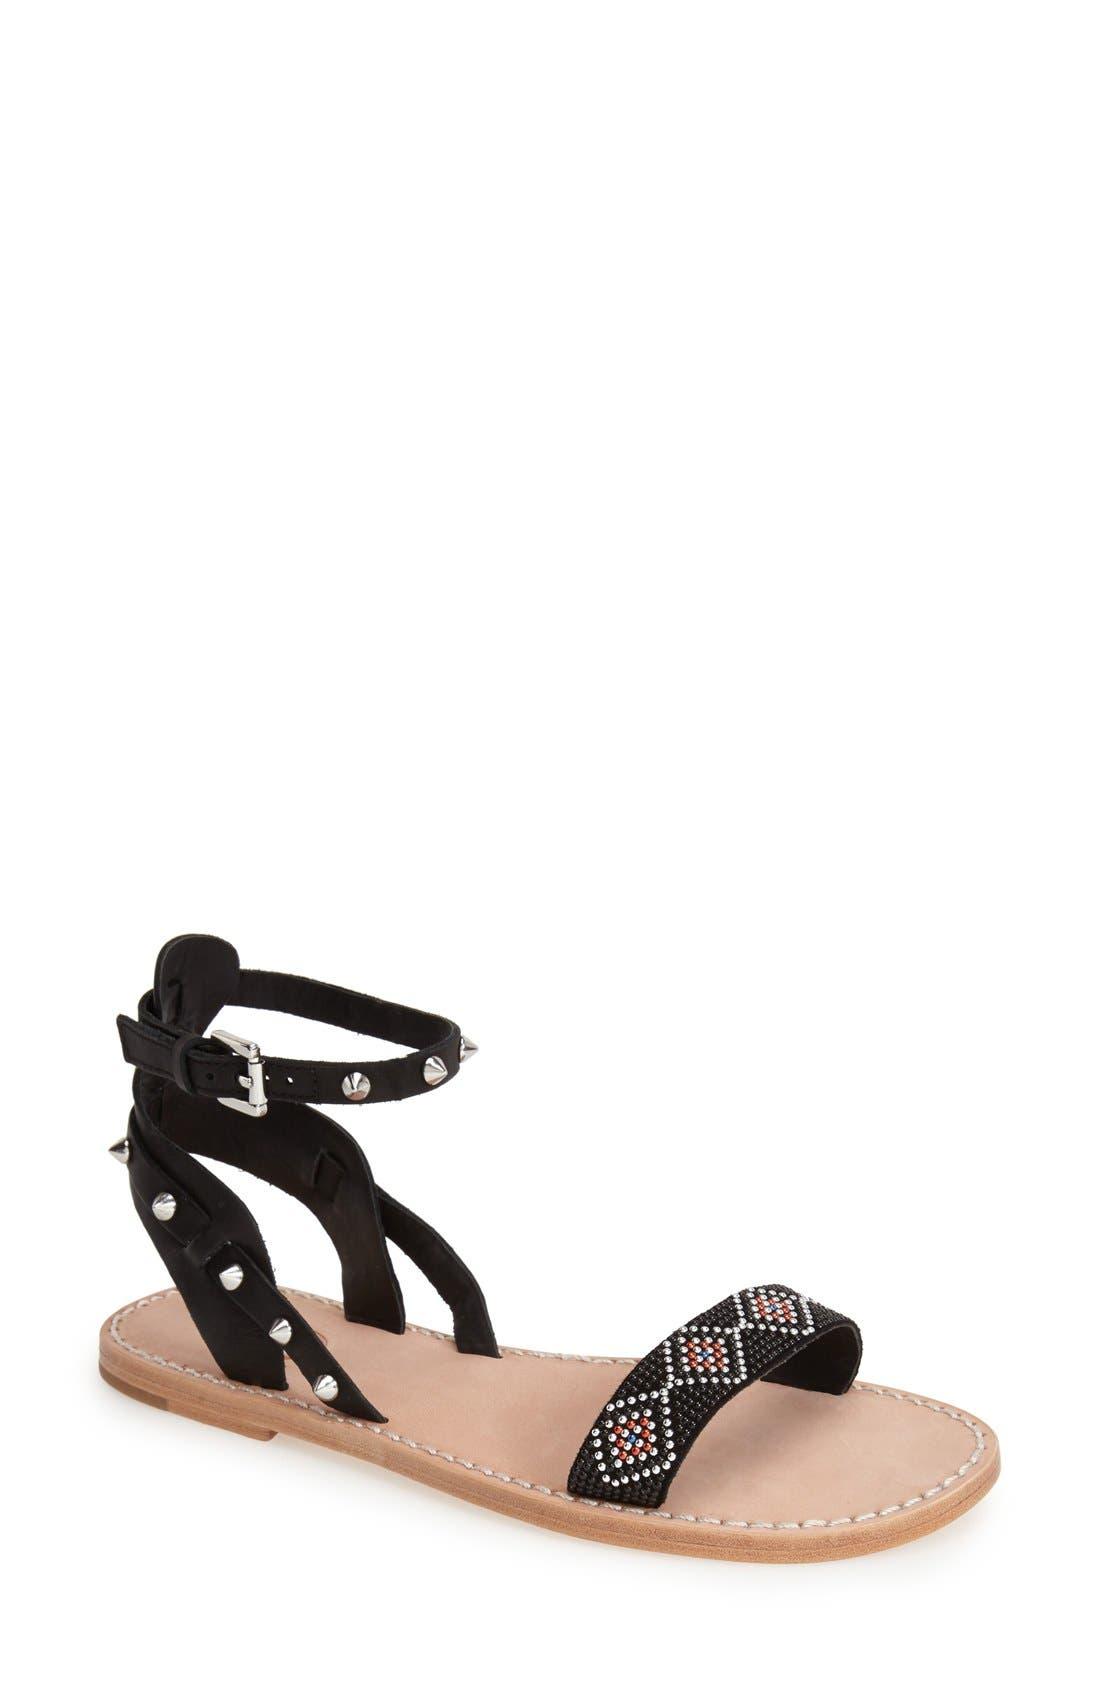 'Pearl' Studded Leather Sandal,                             Main thumbnail 1, color,                             Black/ Black